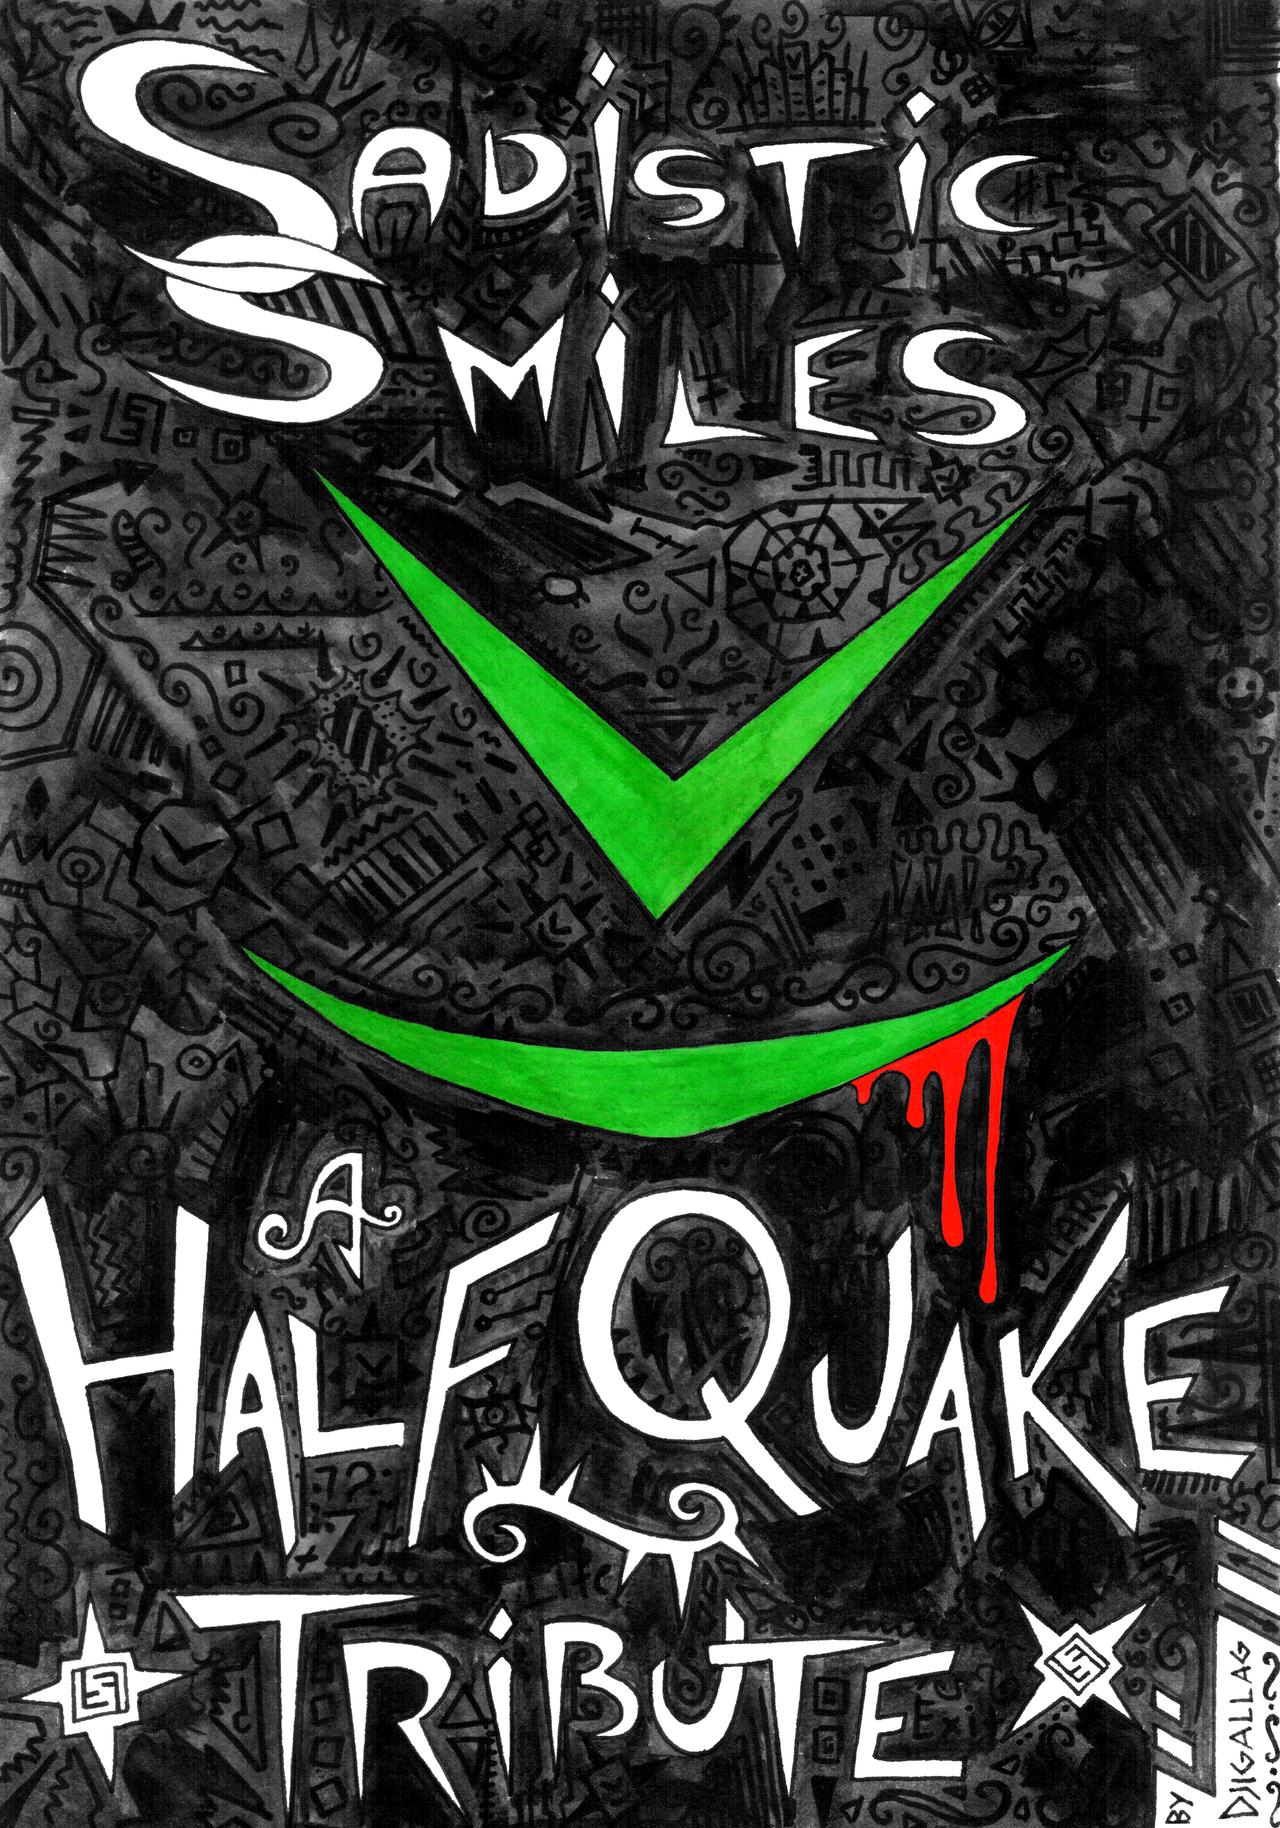 Sadistic Smiles - a HalfQuake Tribute -  Cover by Djigallag